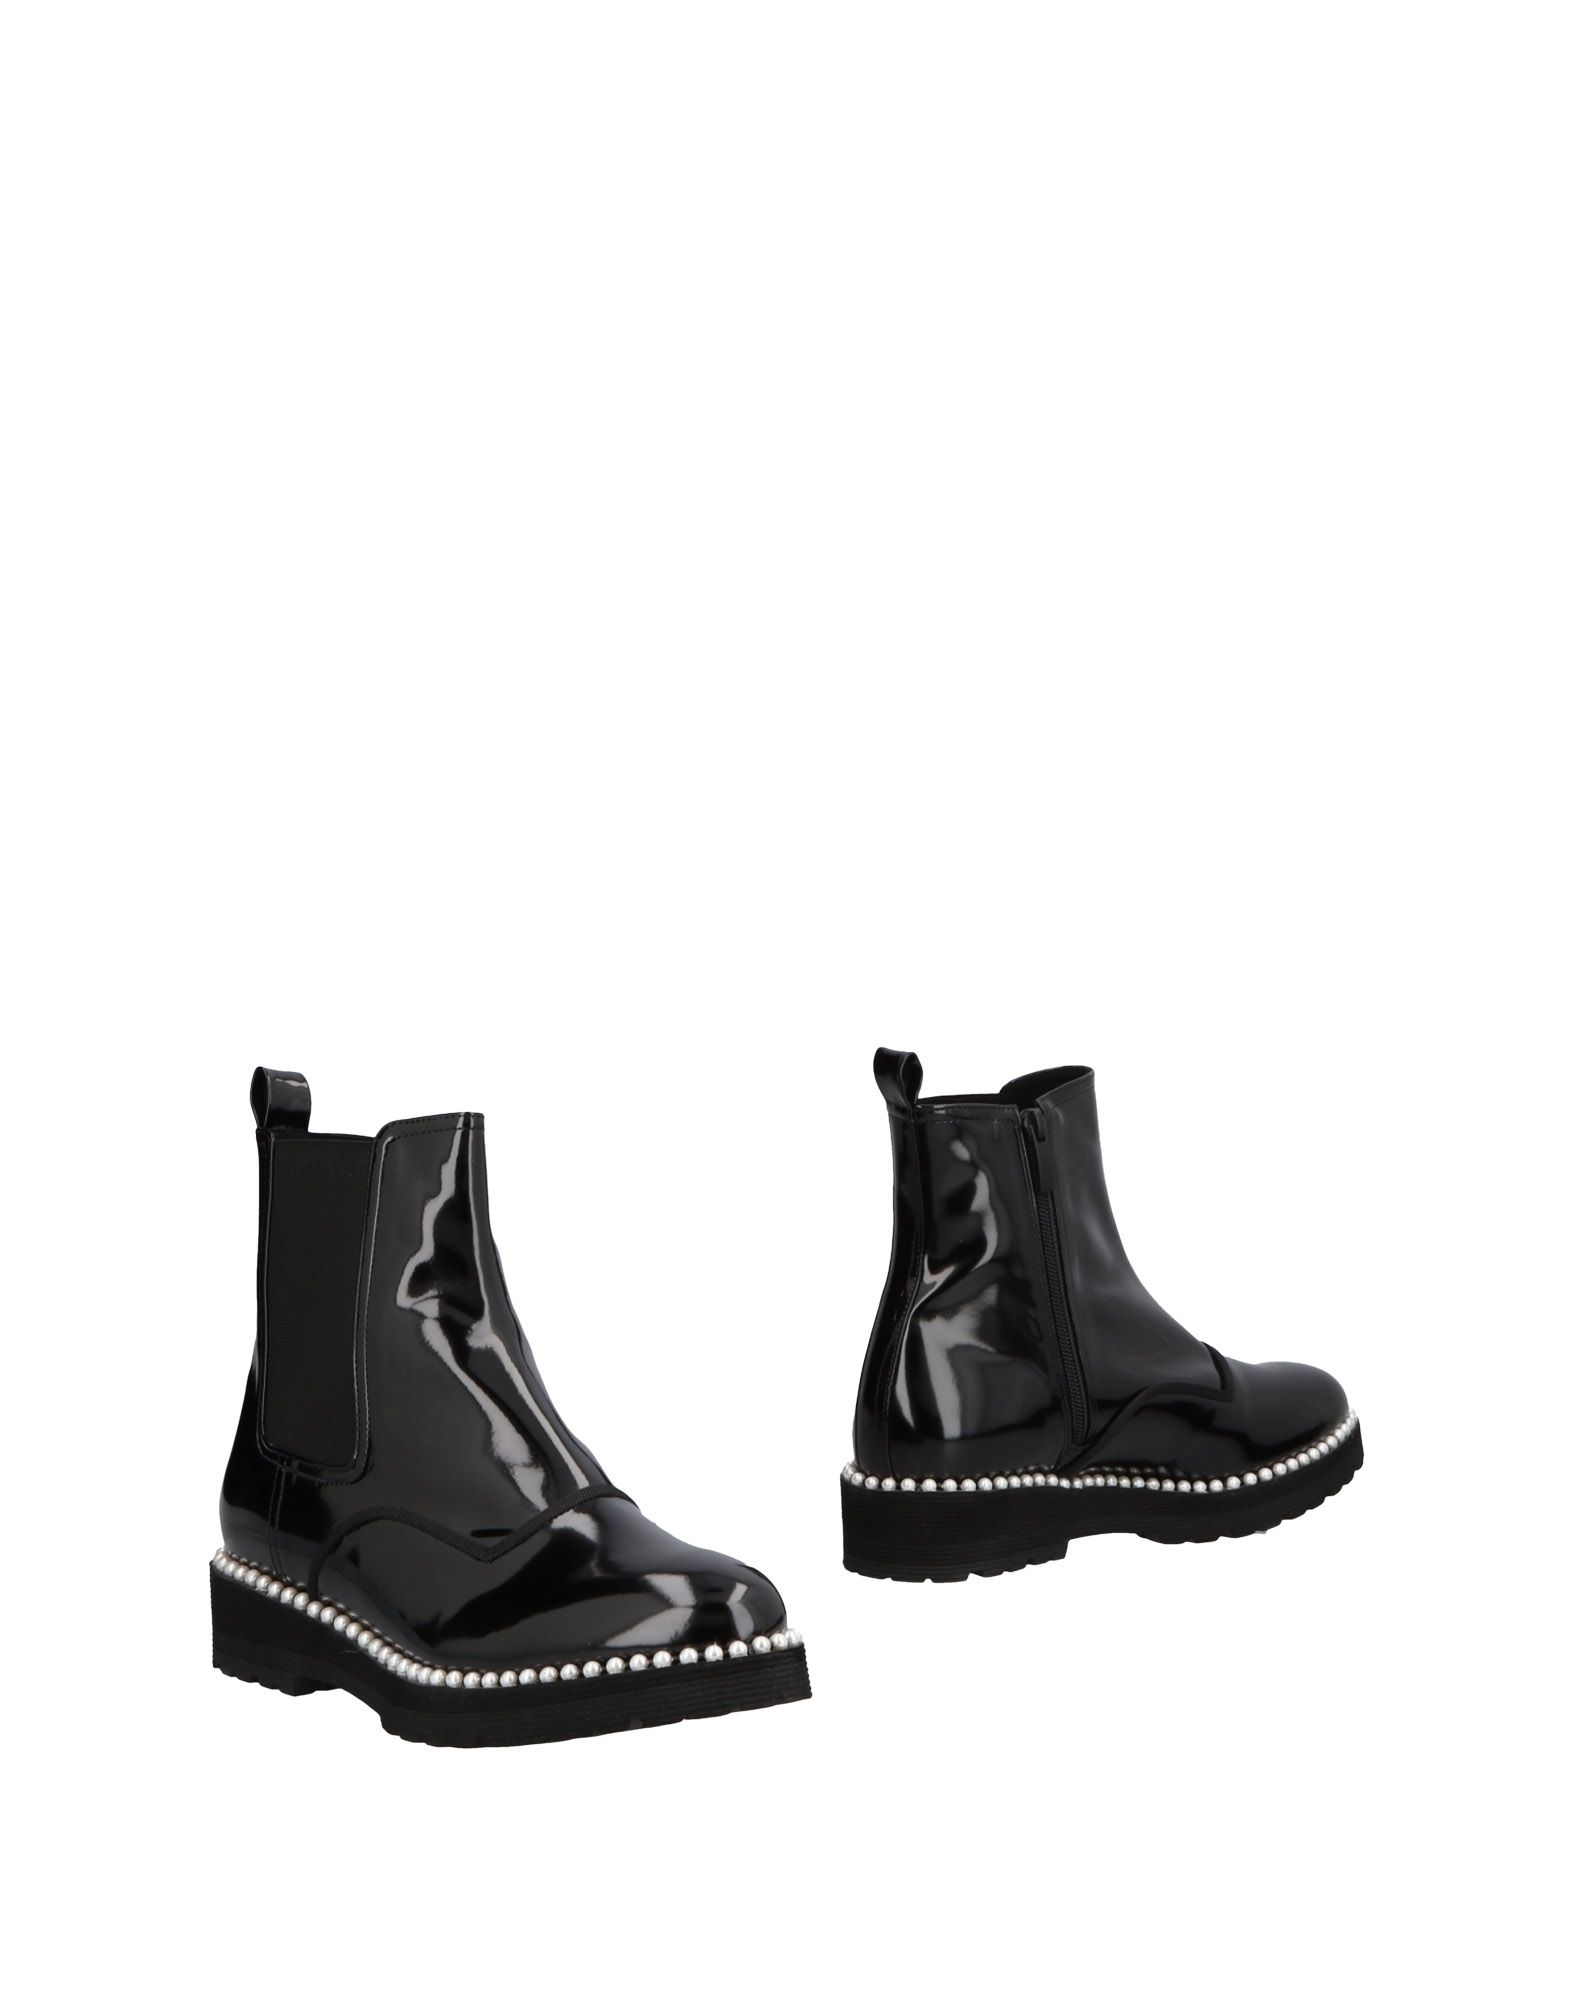 Suecomma Bonnie Chelsea Boots Damen  11453064ECGut aussehende strapazierfähige Schuhe